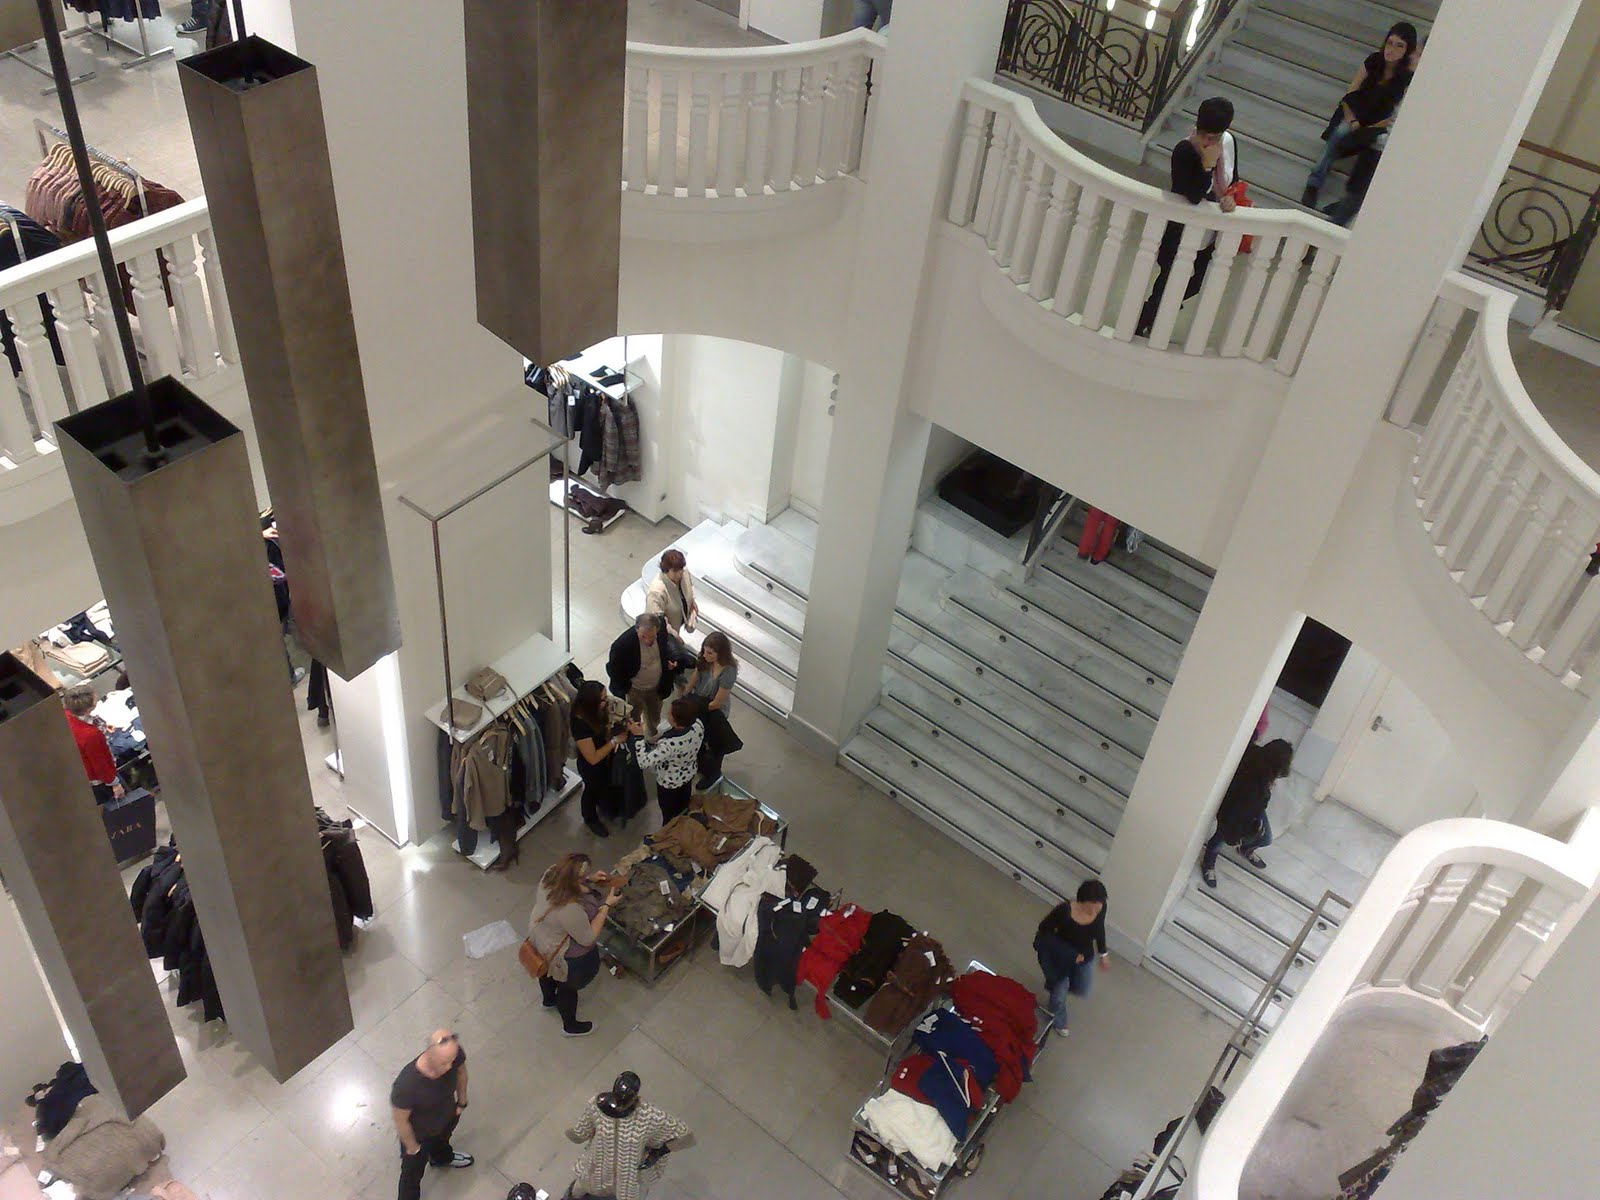 301 moved permanently - Zara gran plaza 2 ...